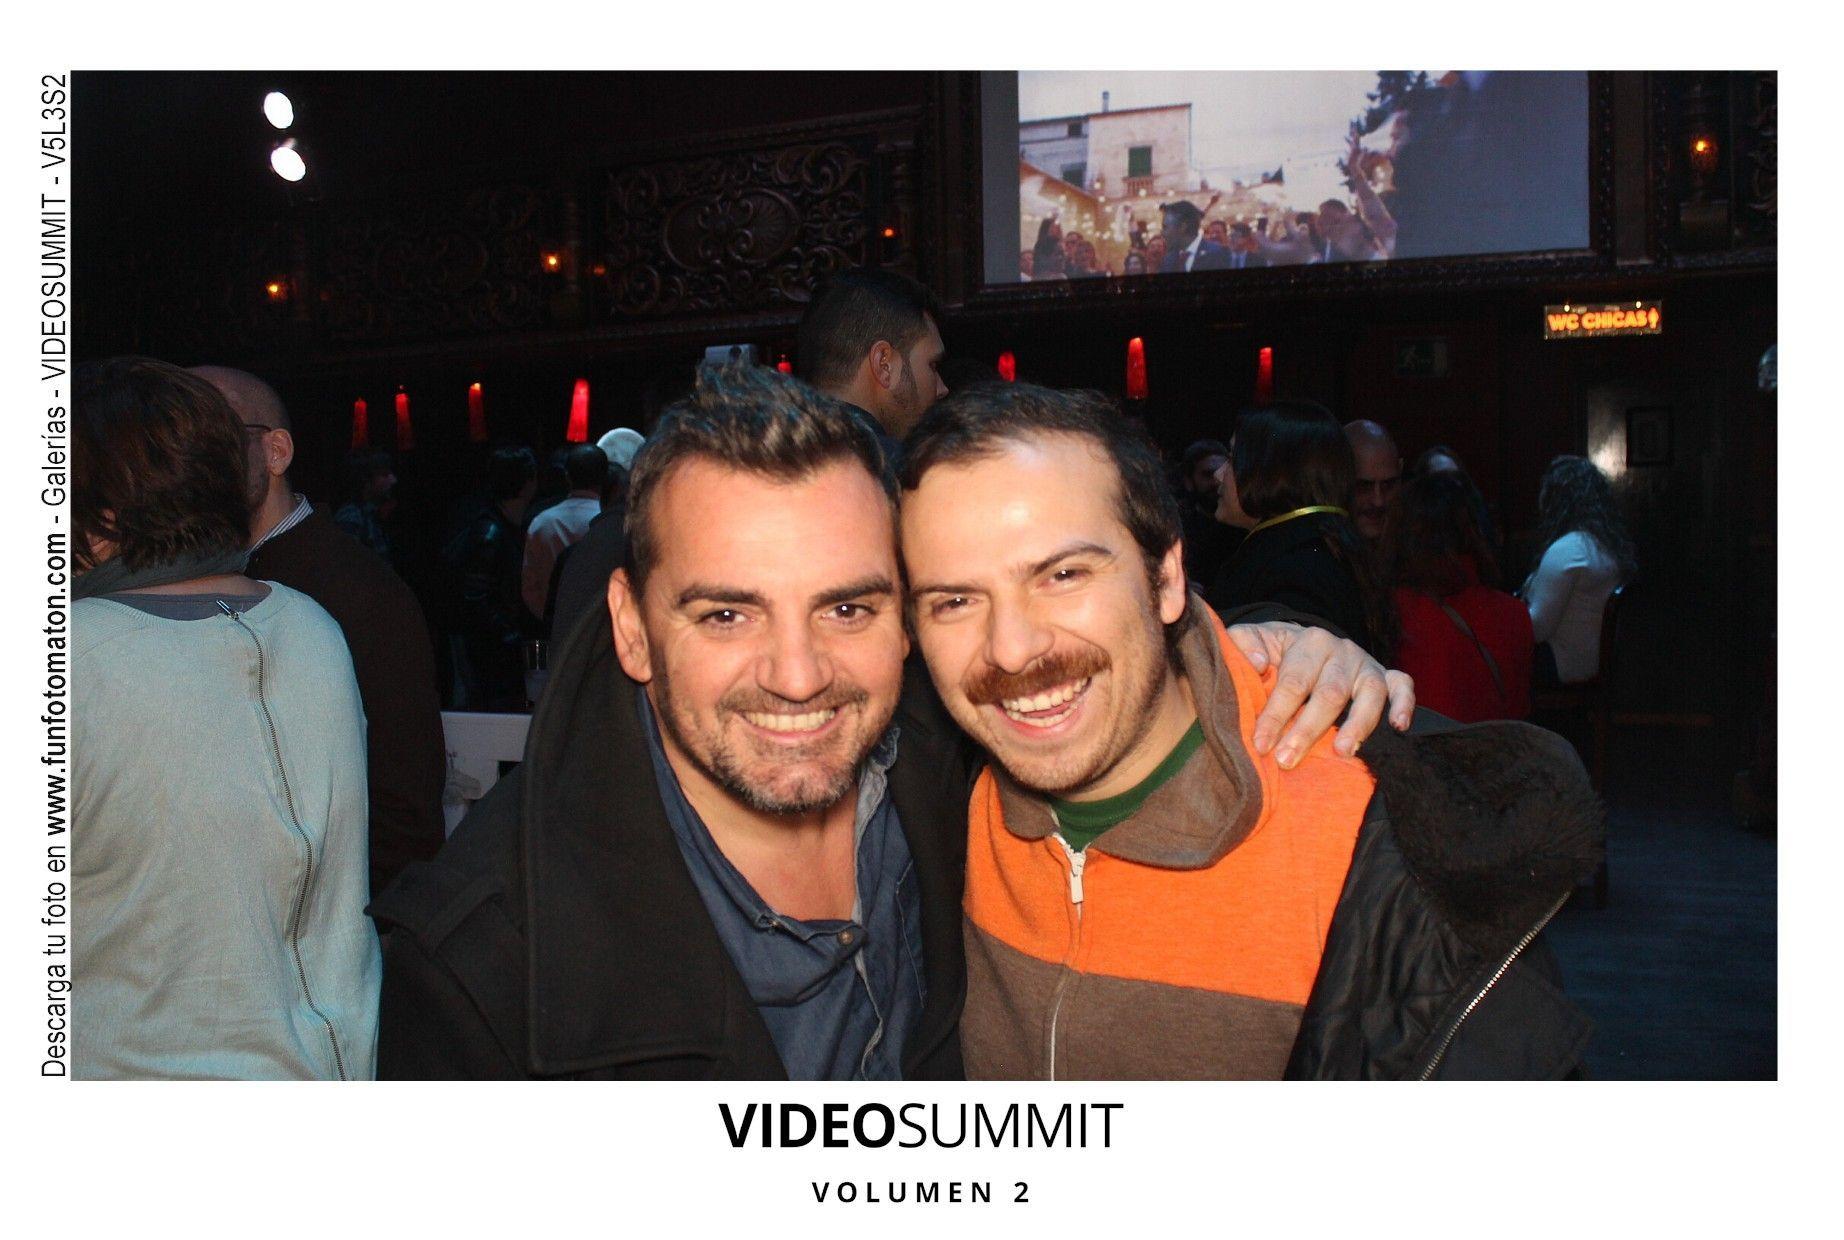 videosummit-vol2-club-party-038